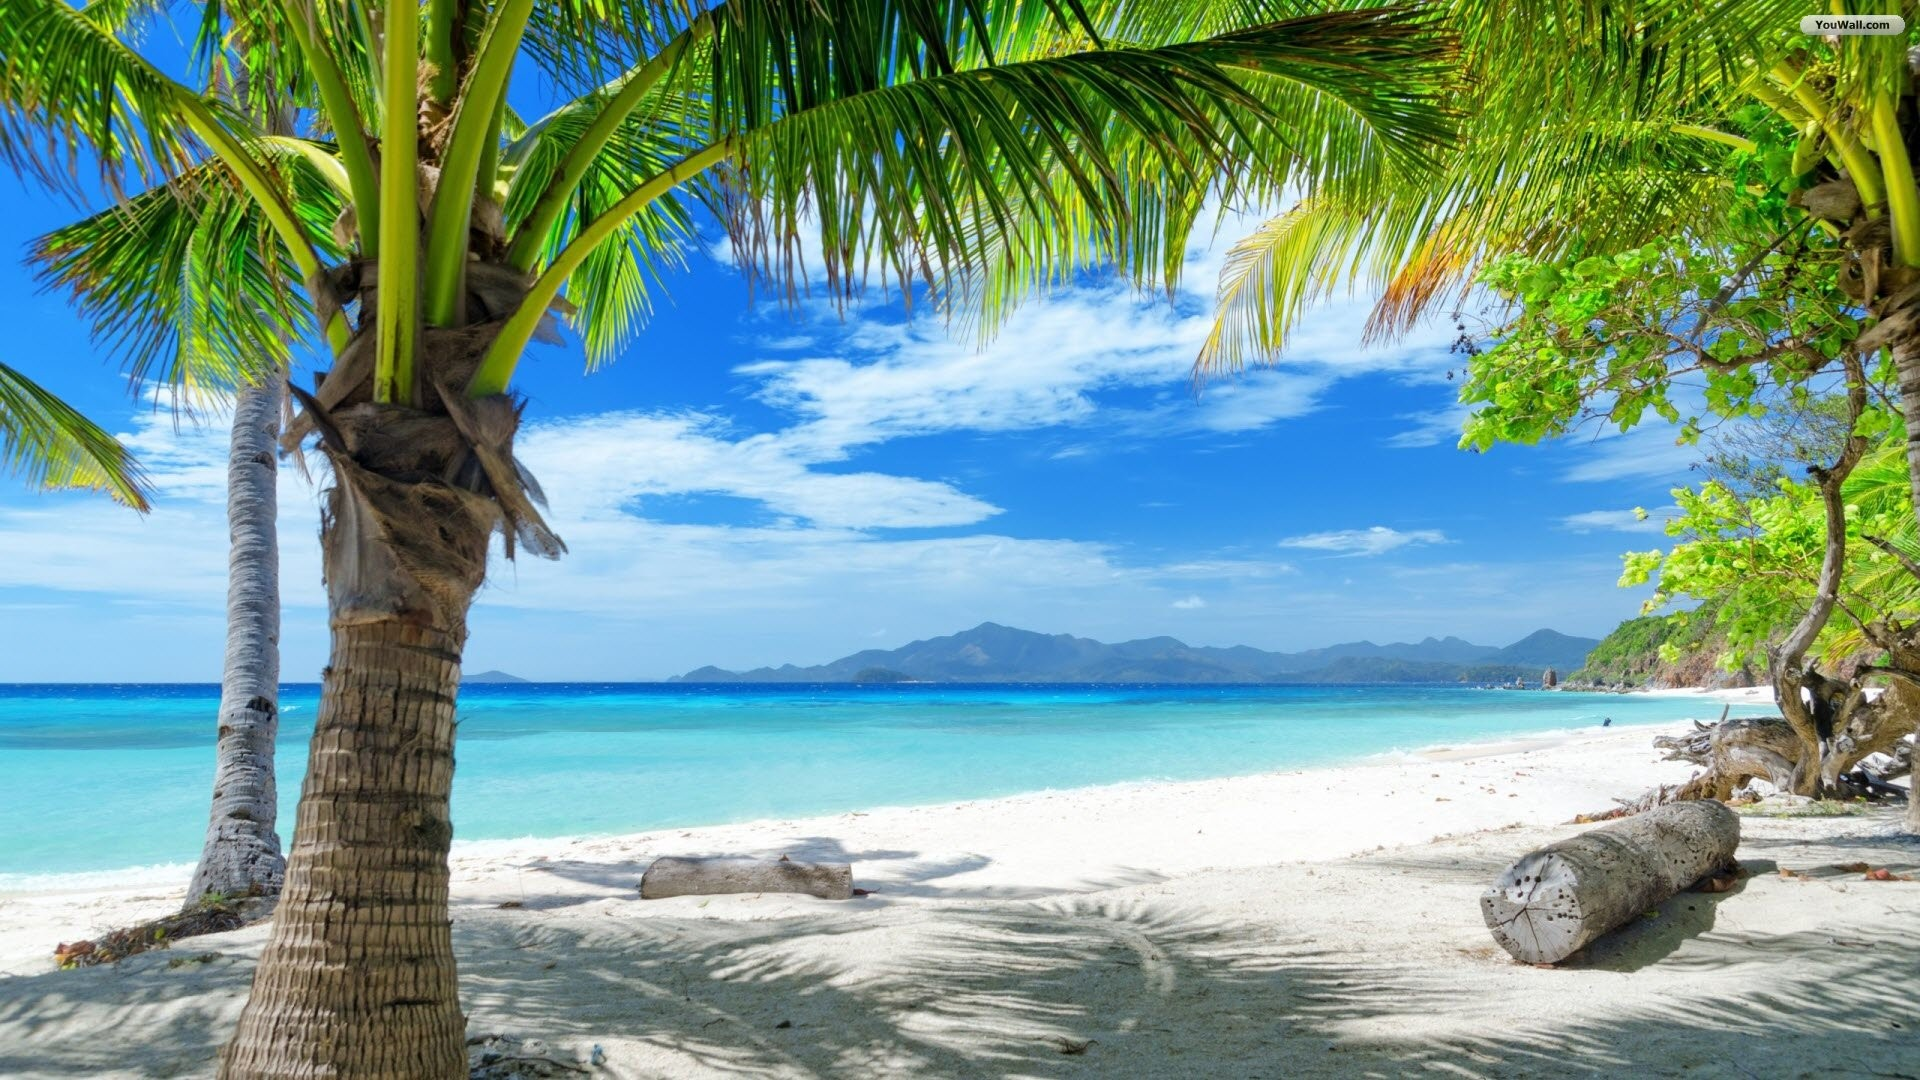 beach paradise wallpaper ·①